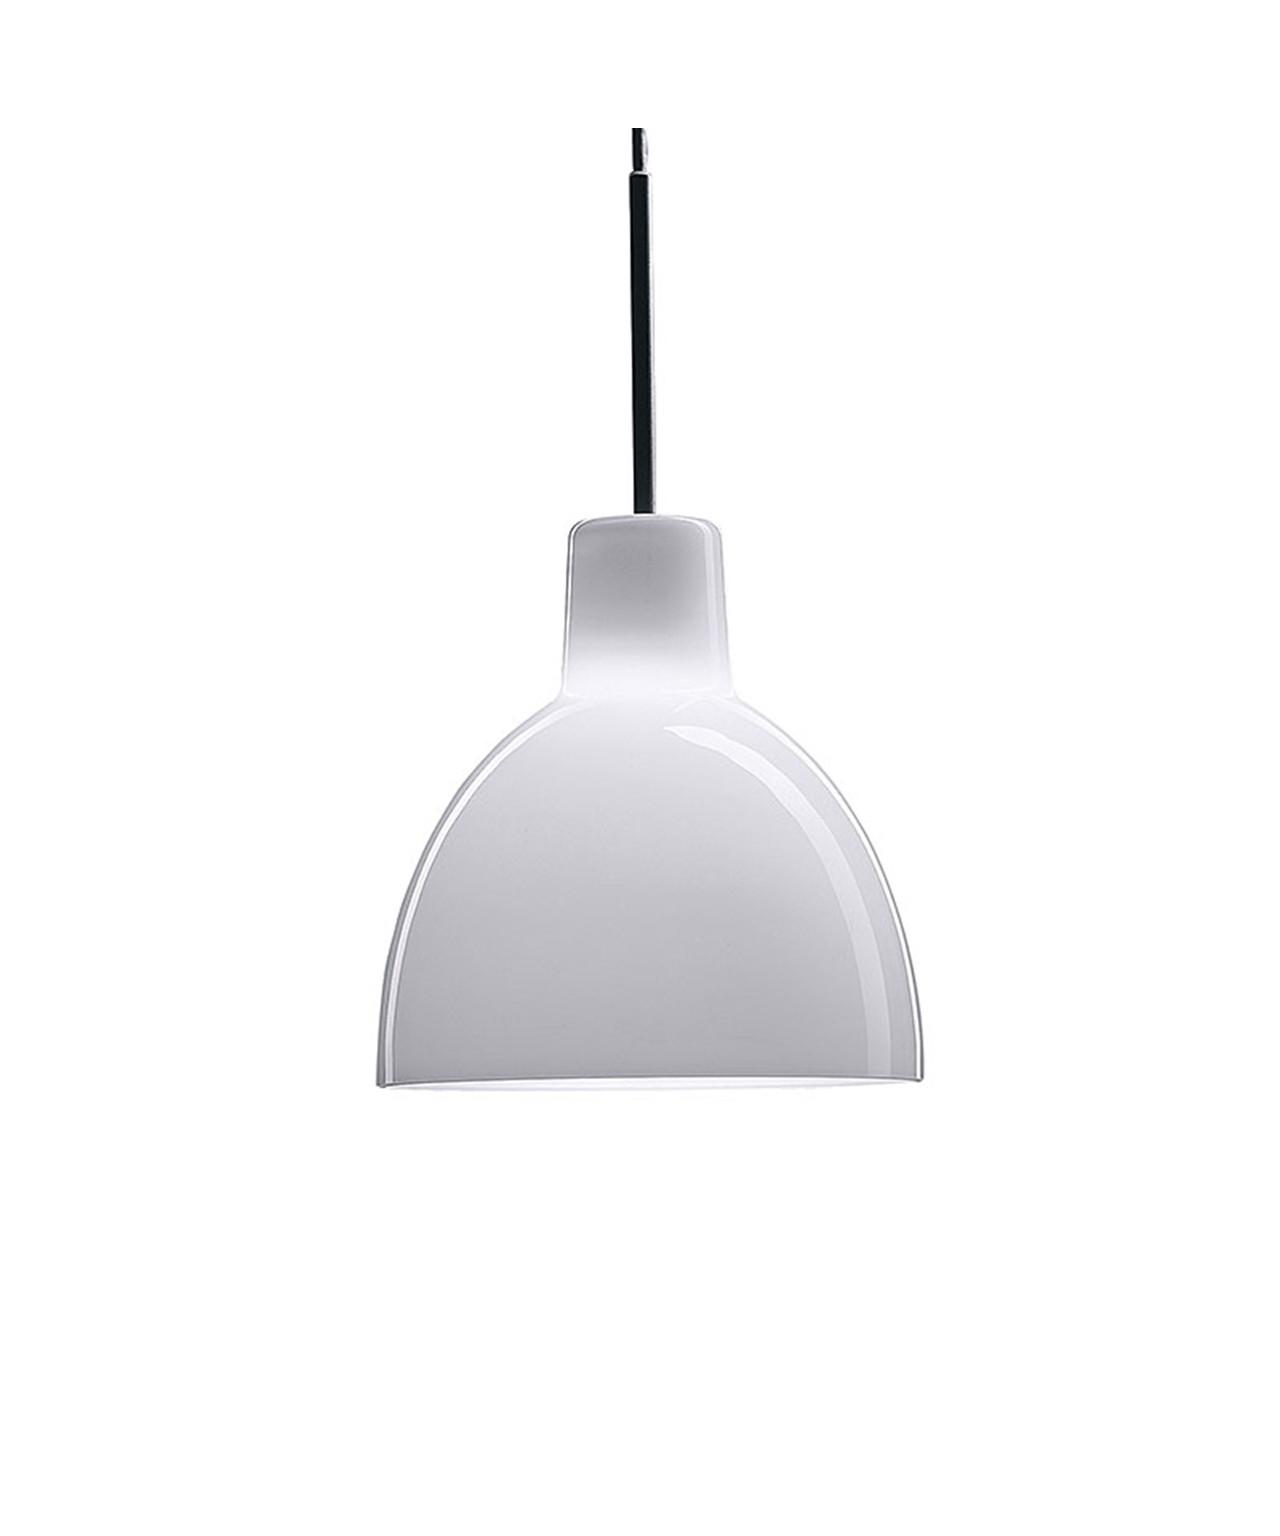 troldbod 155 glas pendelleuchte louis poulsen lampemesteren. Black Bedroom Furniture Sets. Home Design Ideas